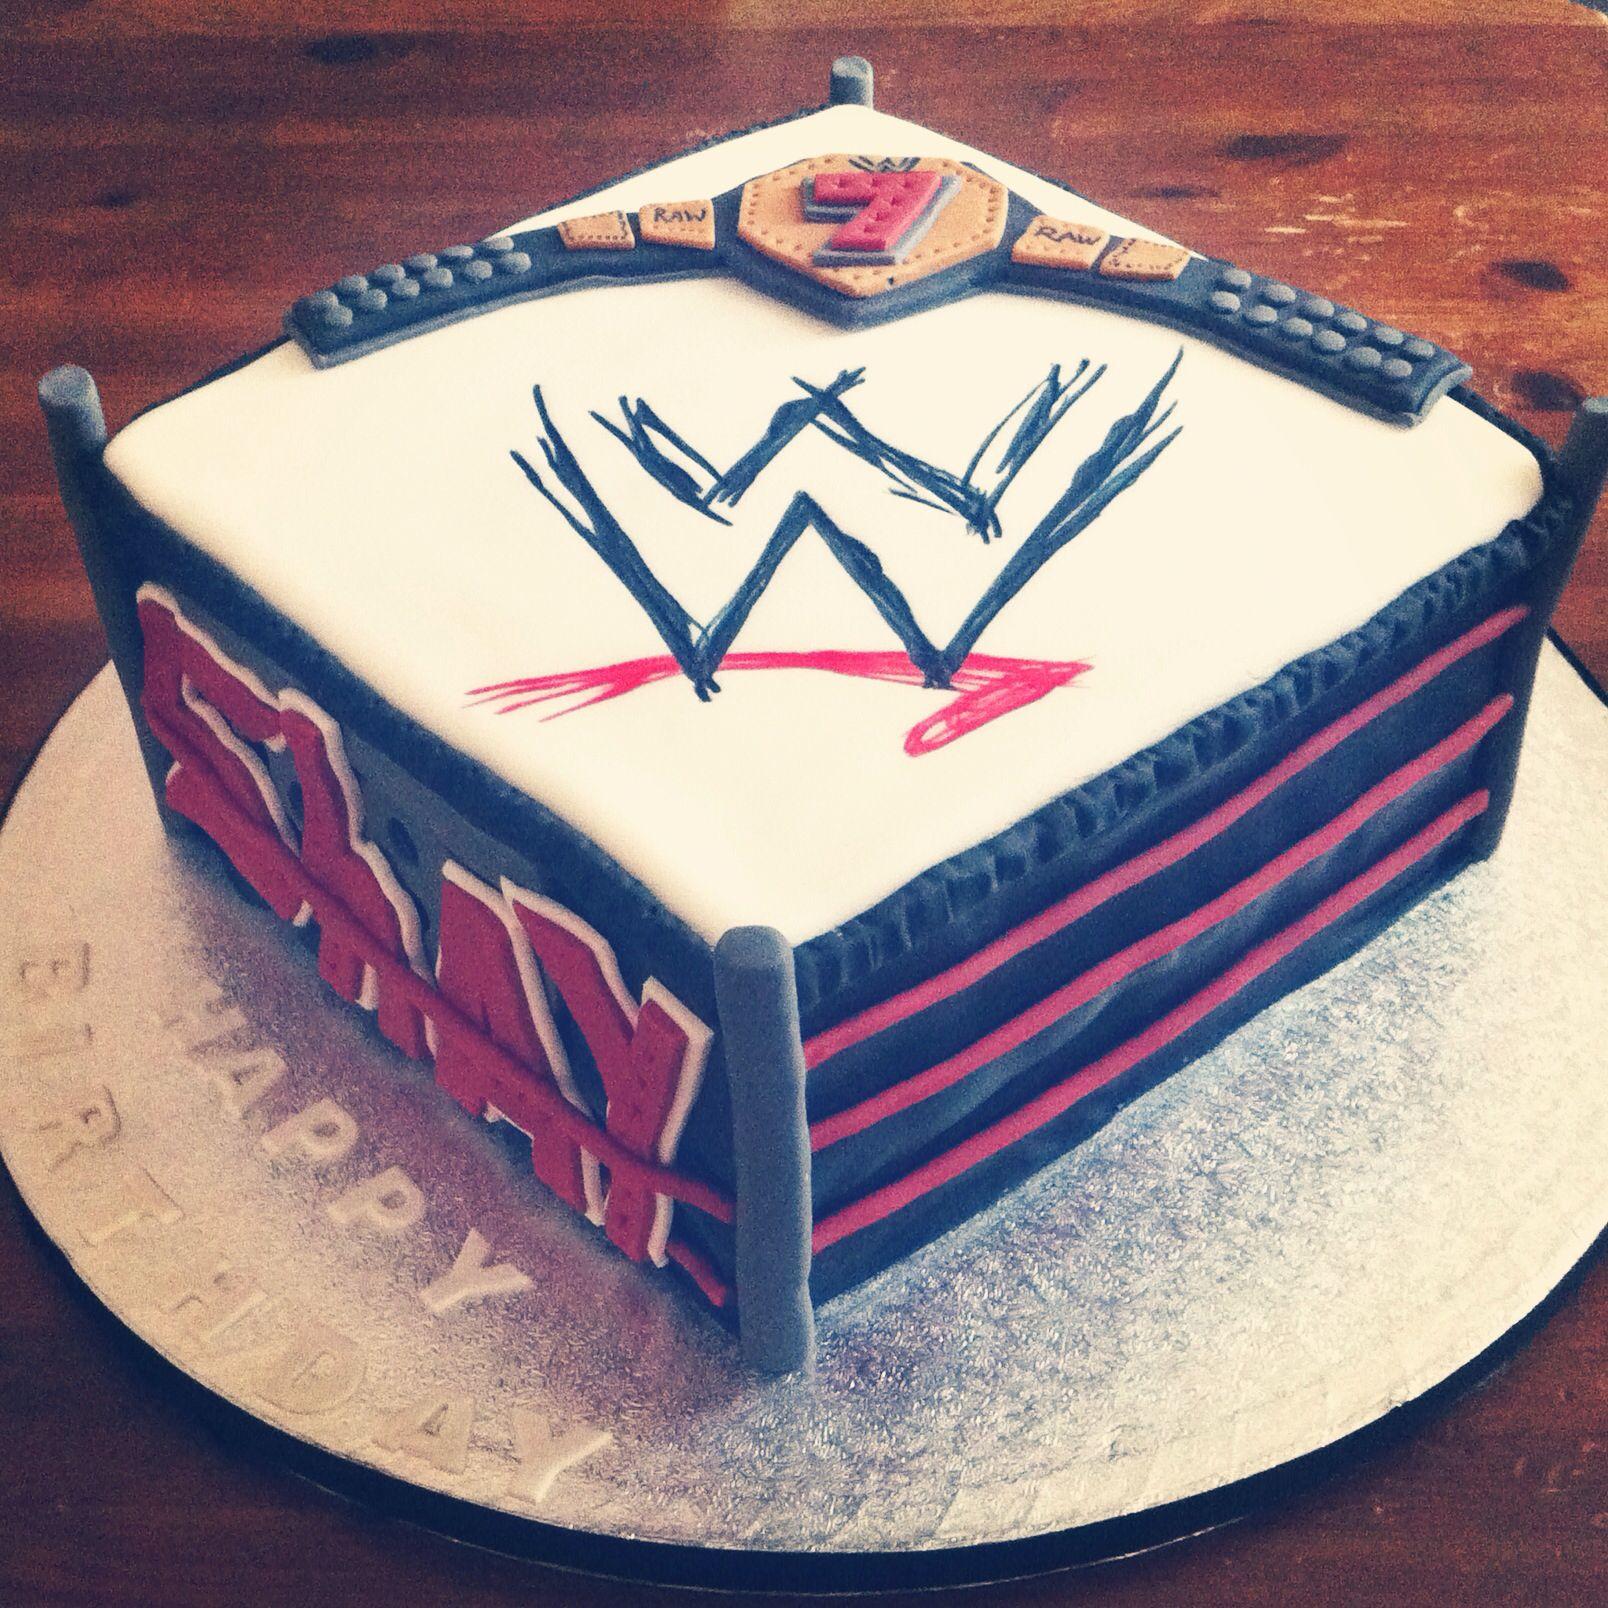 Wwf Wrestling Ring Cake With Belt Nai Nai Nai S Cake